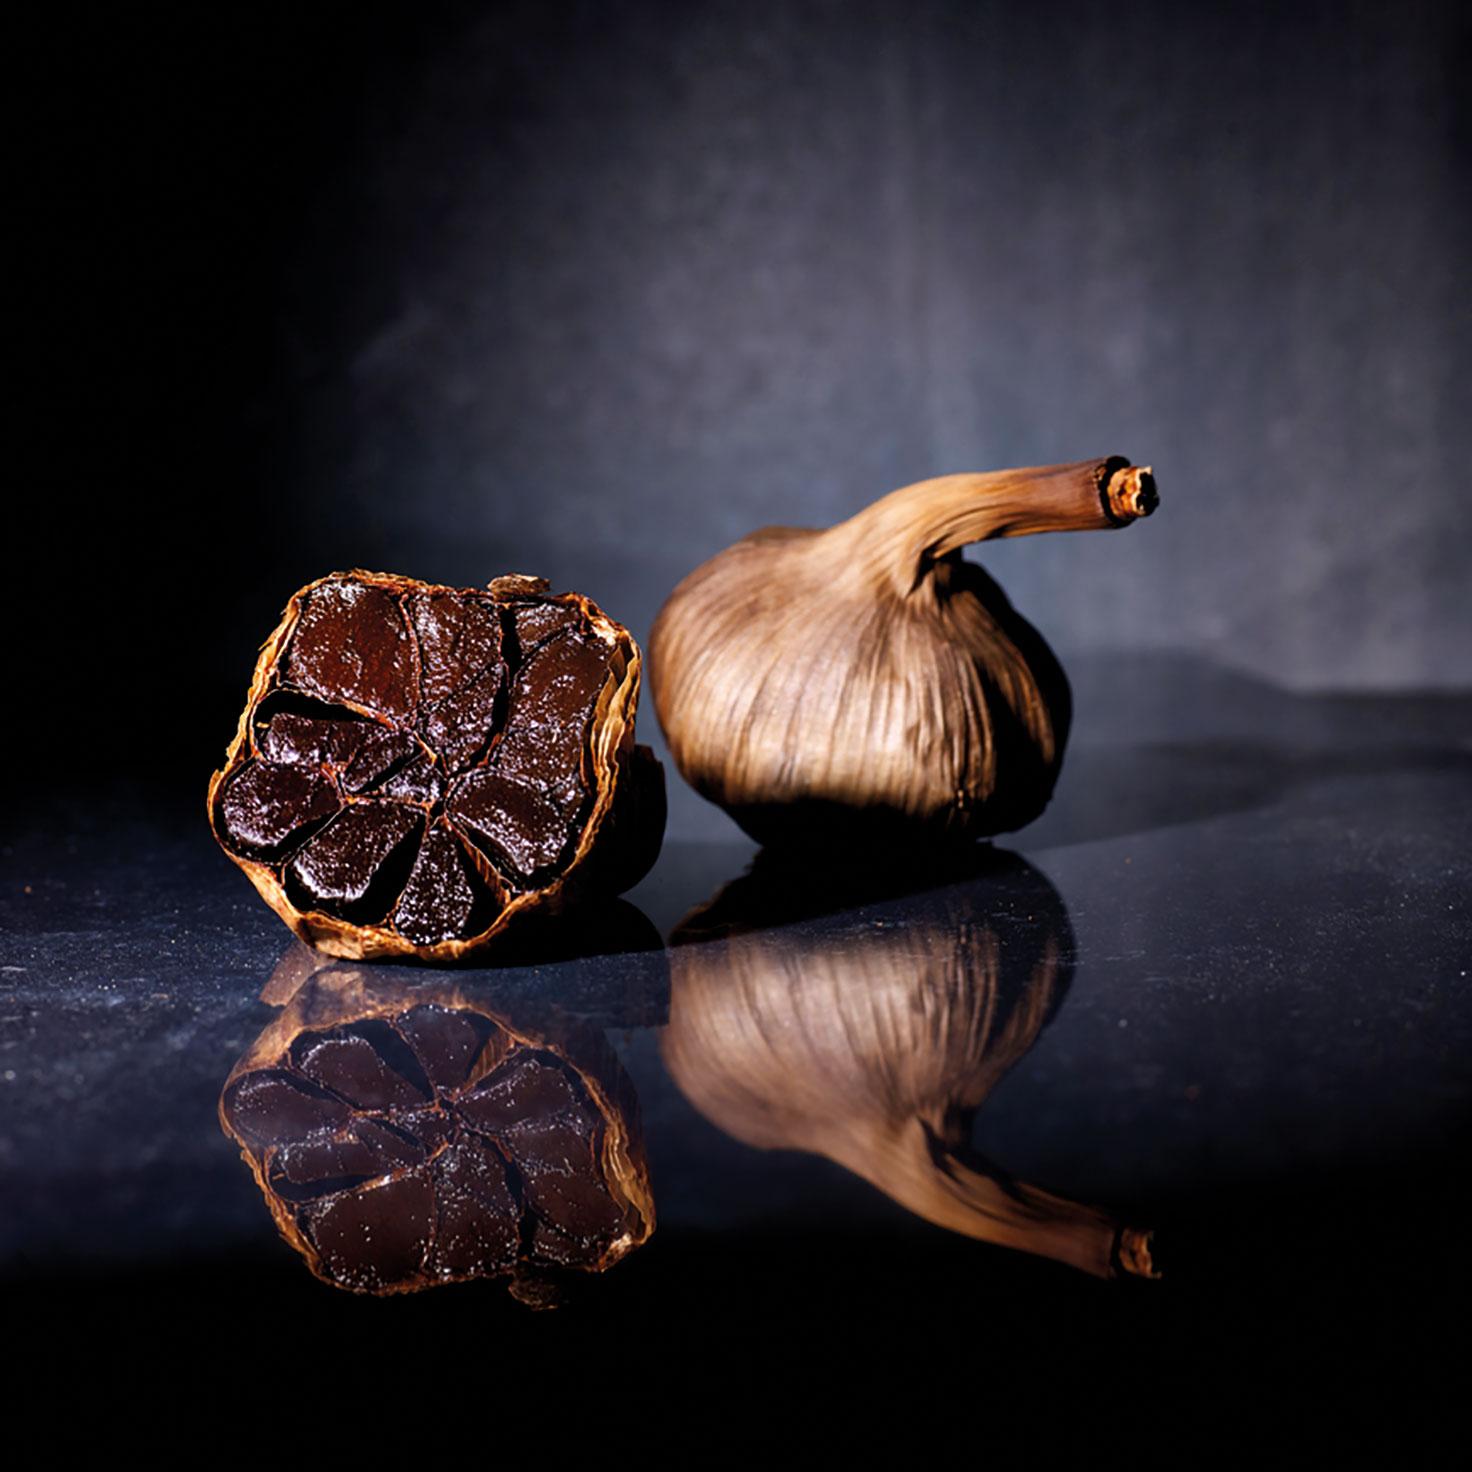 Food Tech: Black is the New Garlic